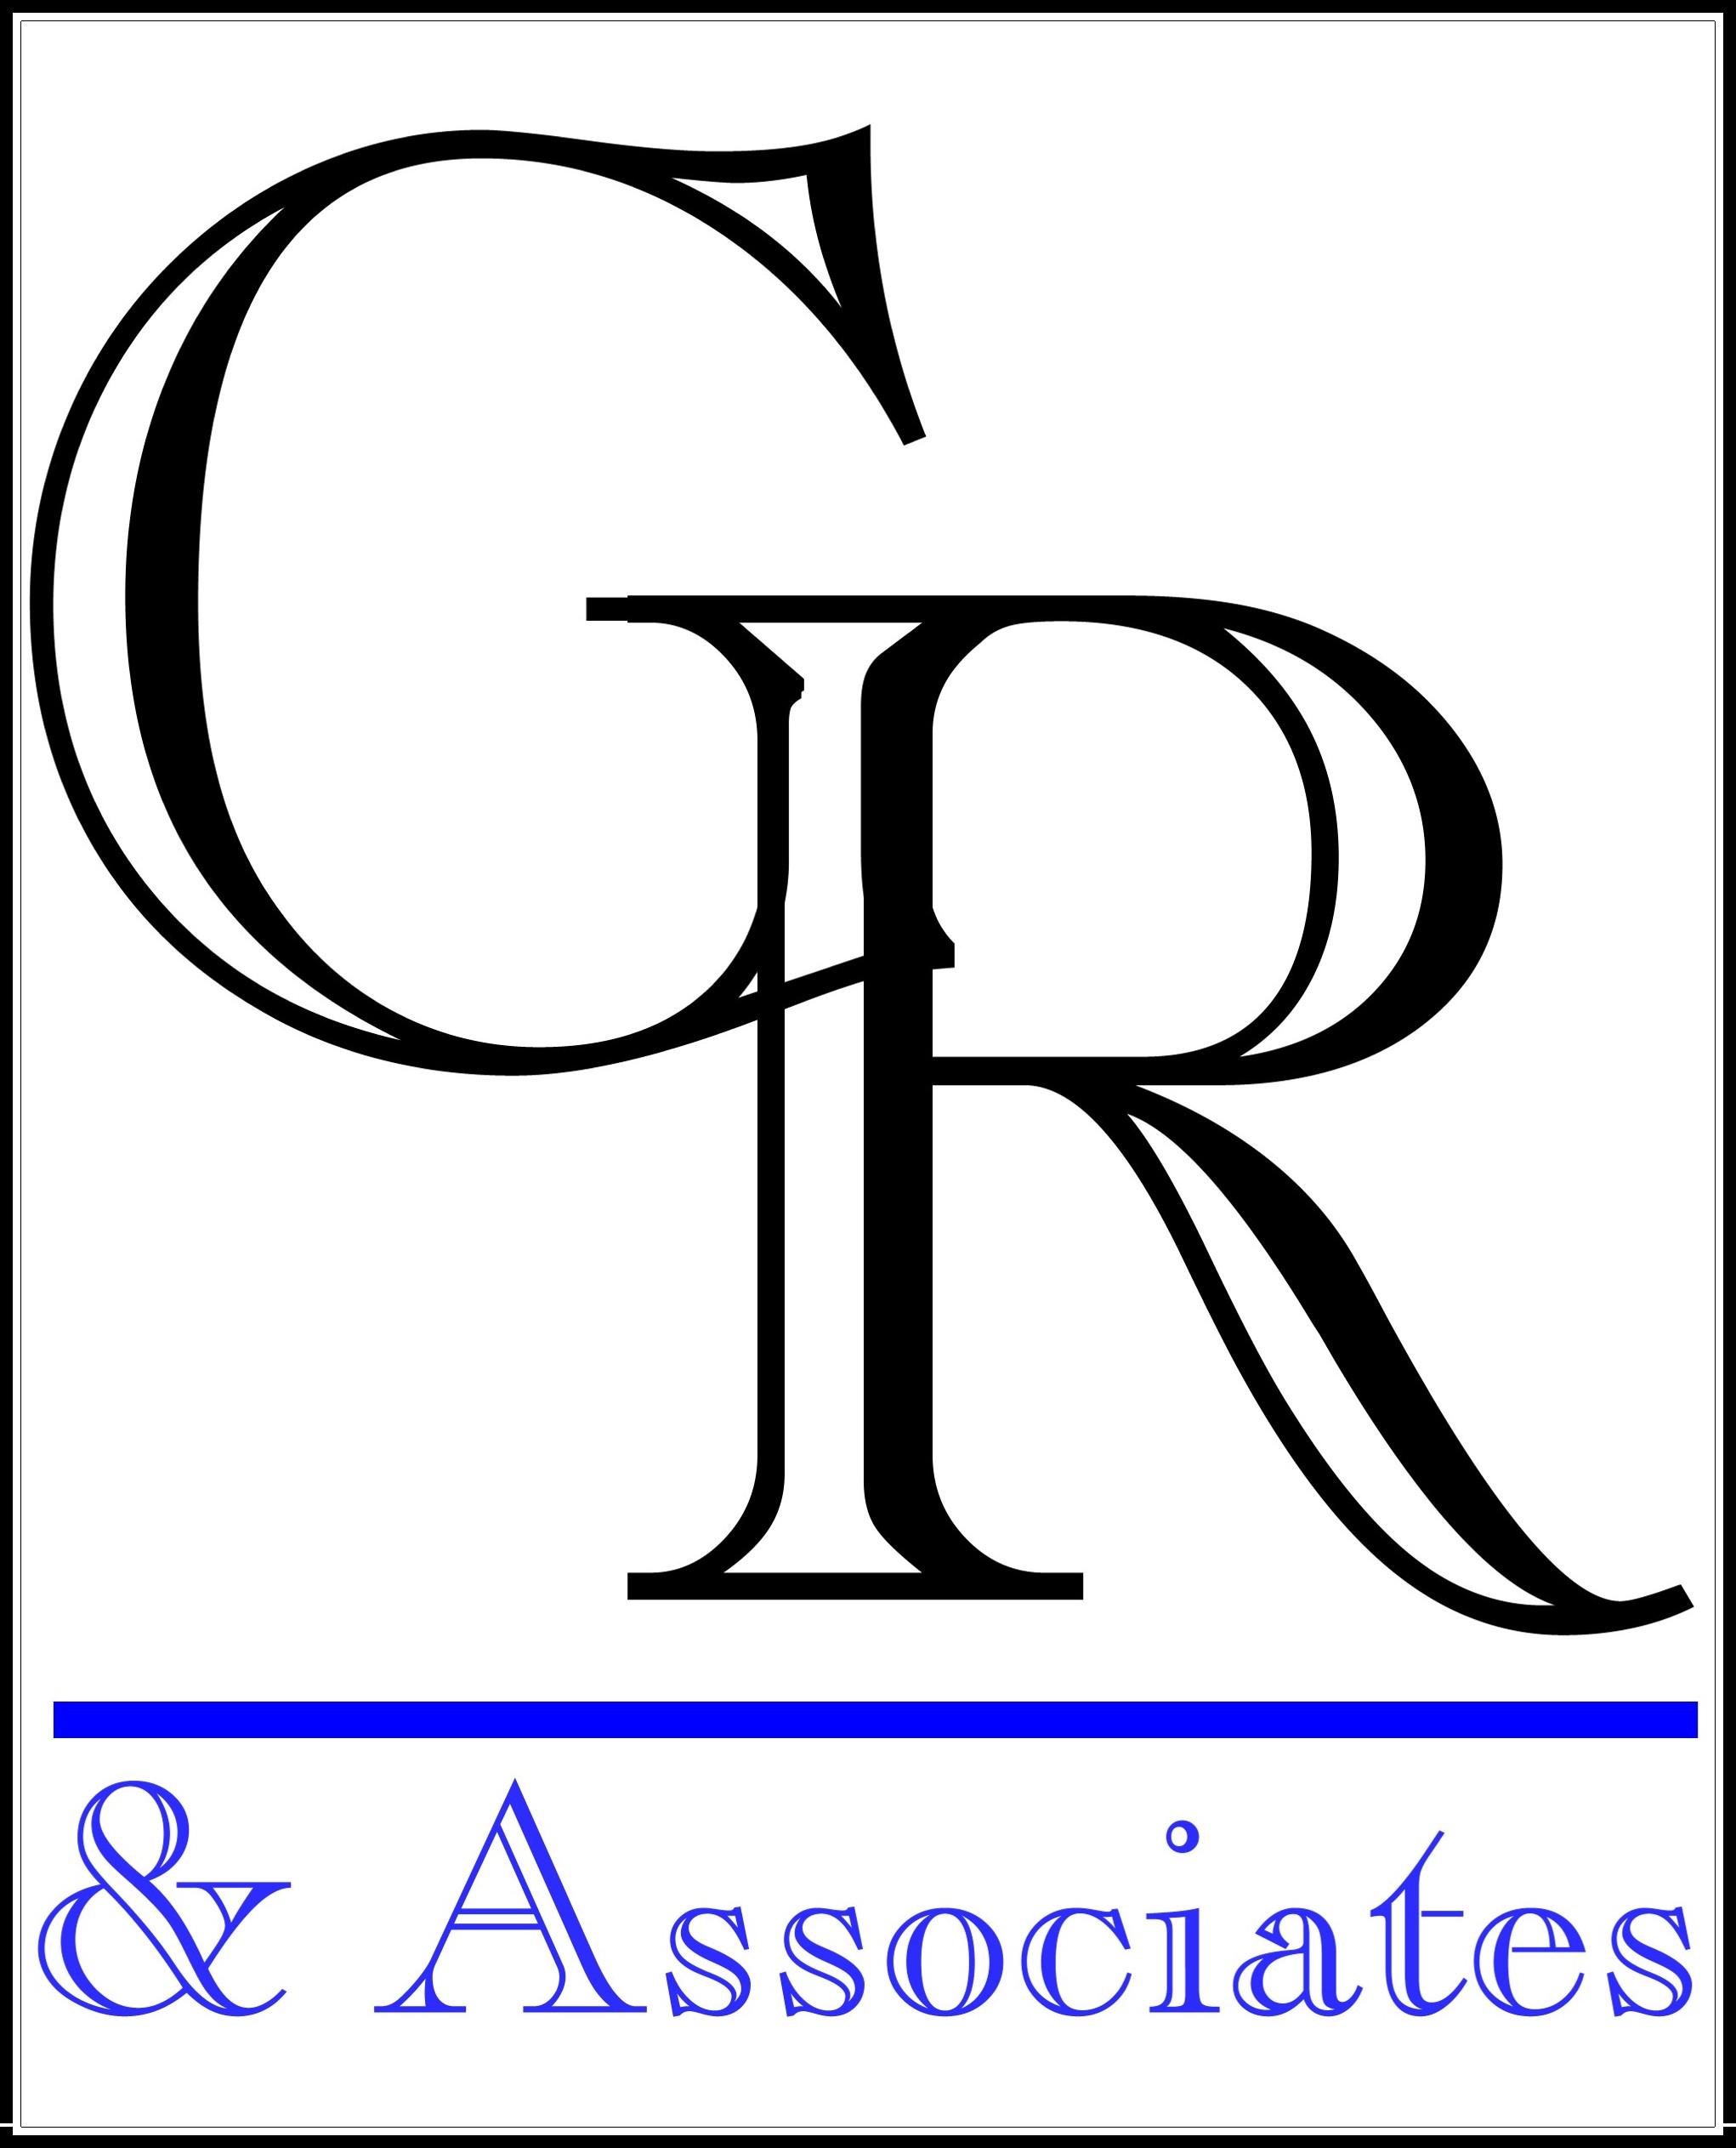 George Ripsom & Associates